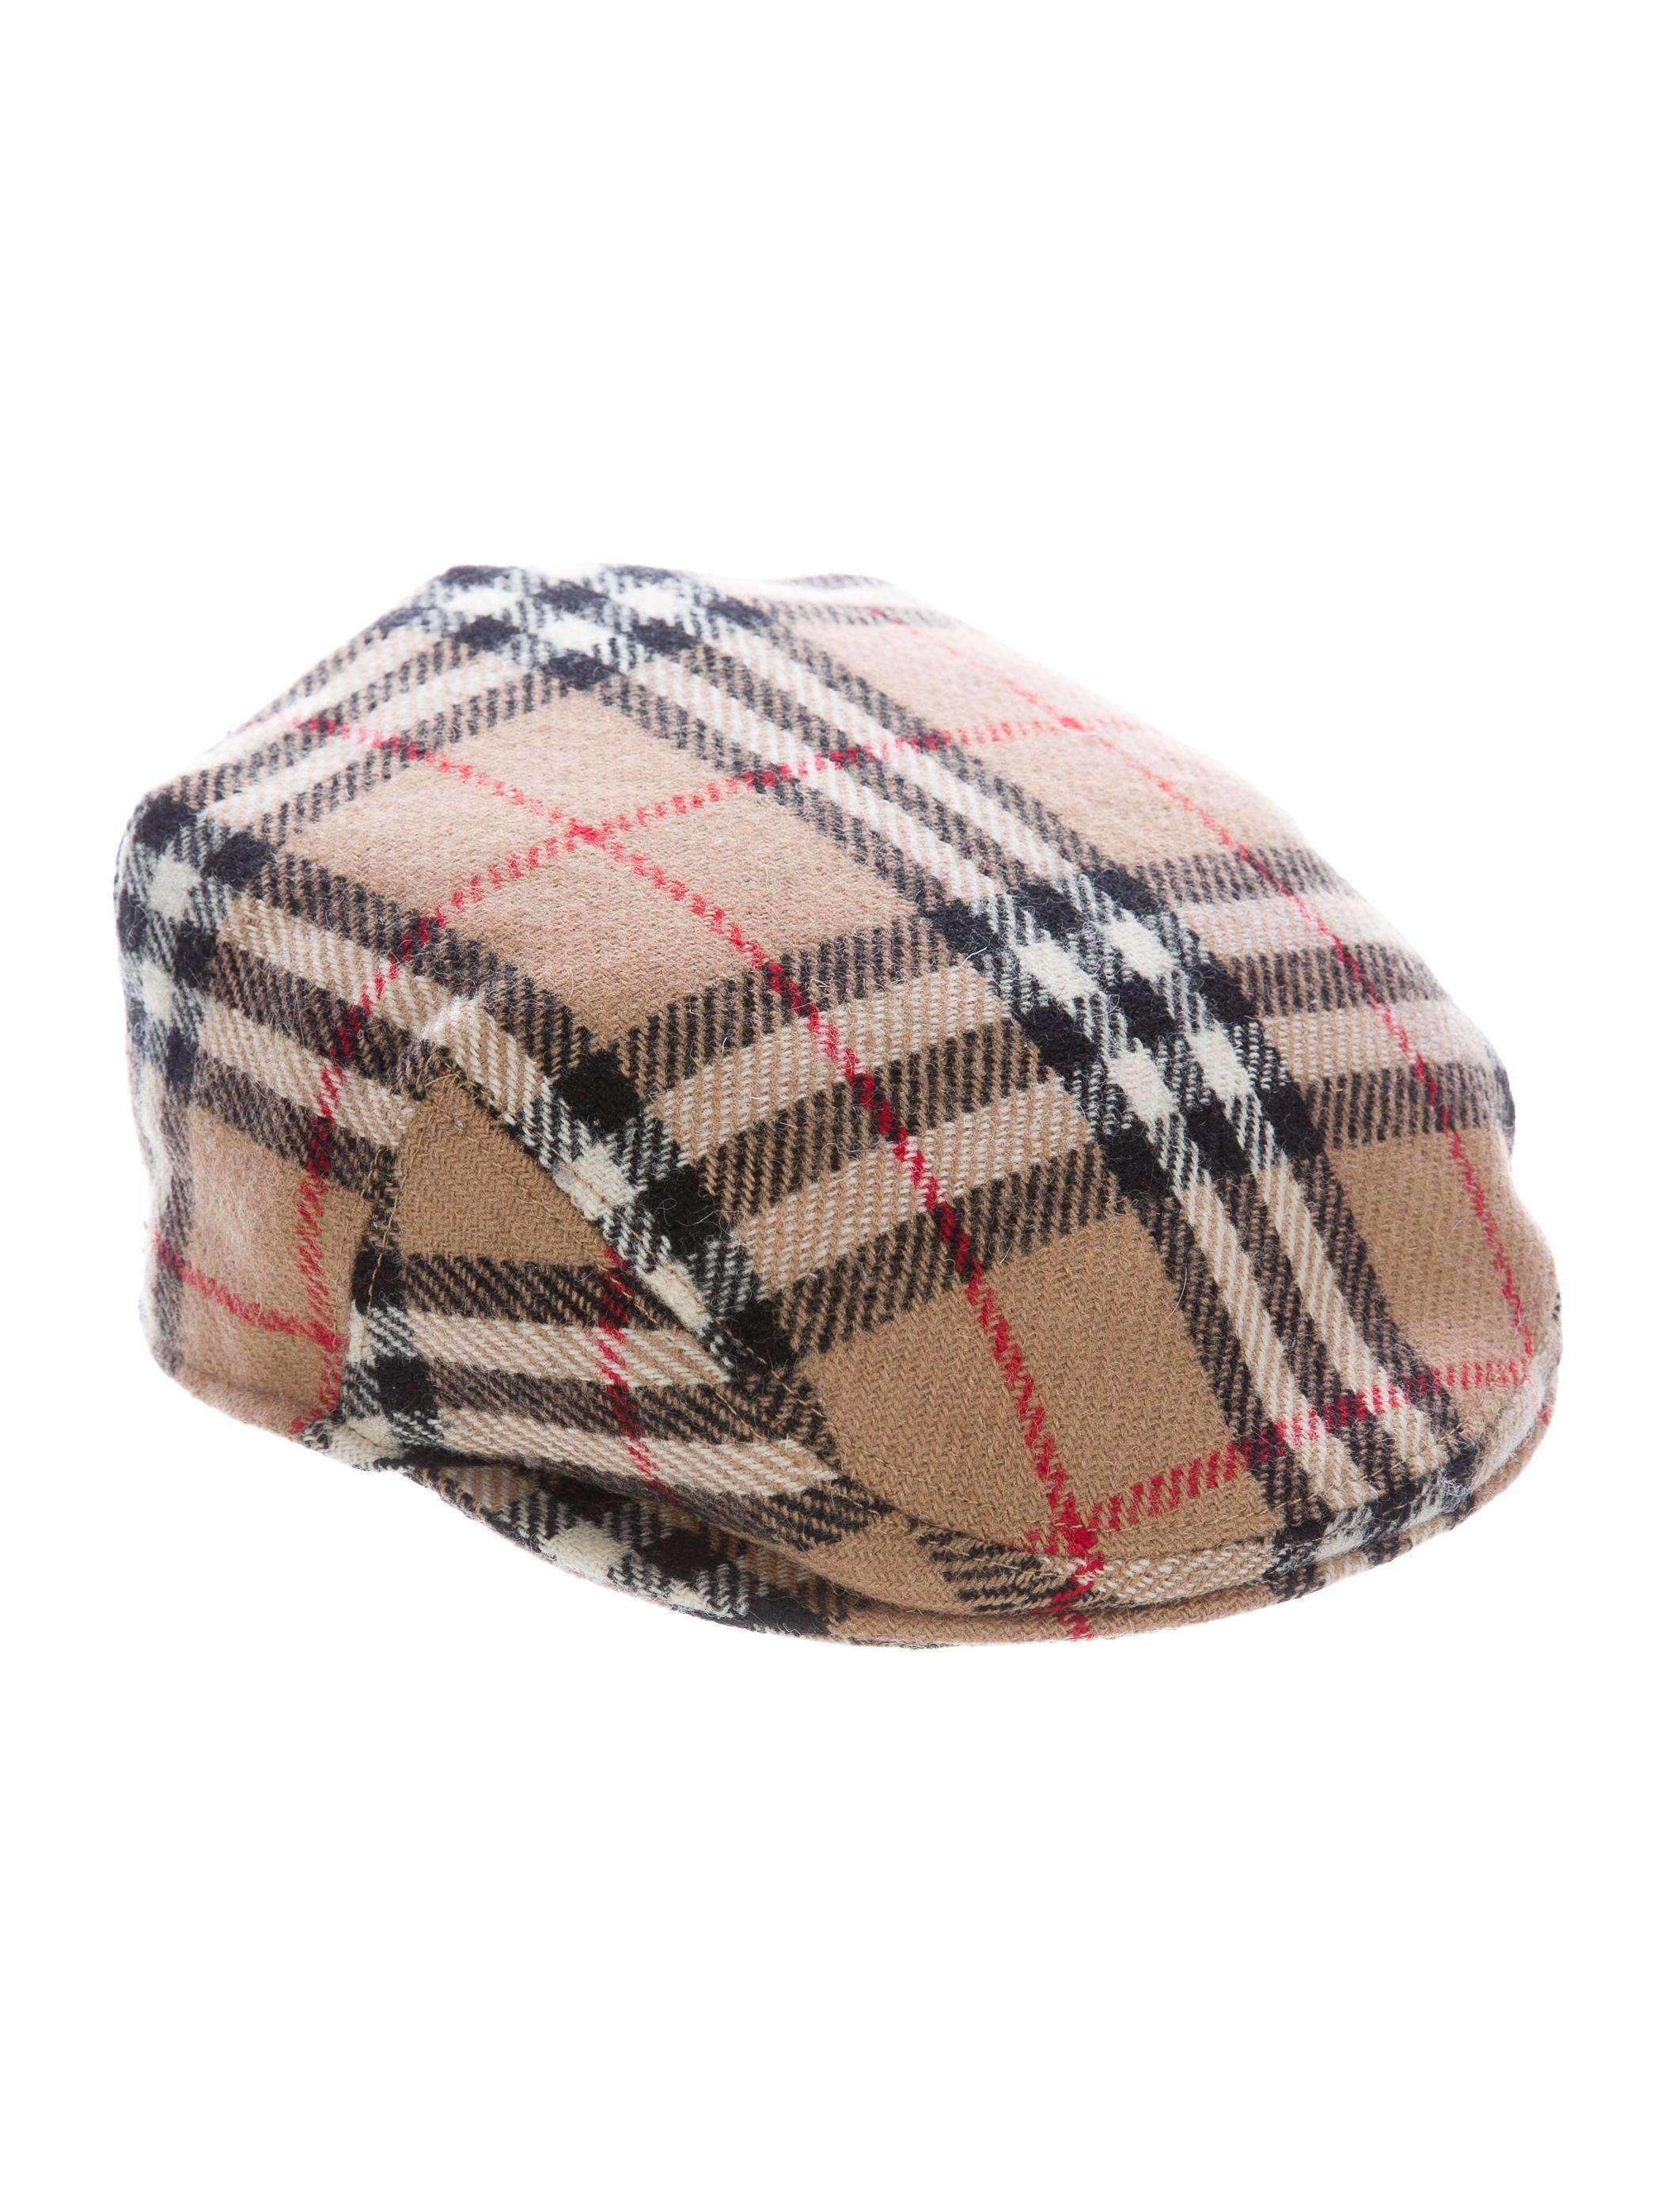 78f71a0a3ae Burberry London Nova Check Wool Newsboy Hat - Accessories ...